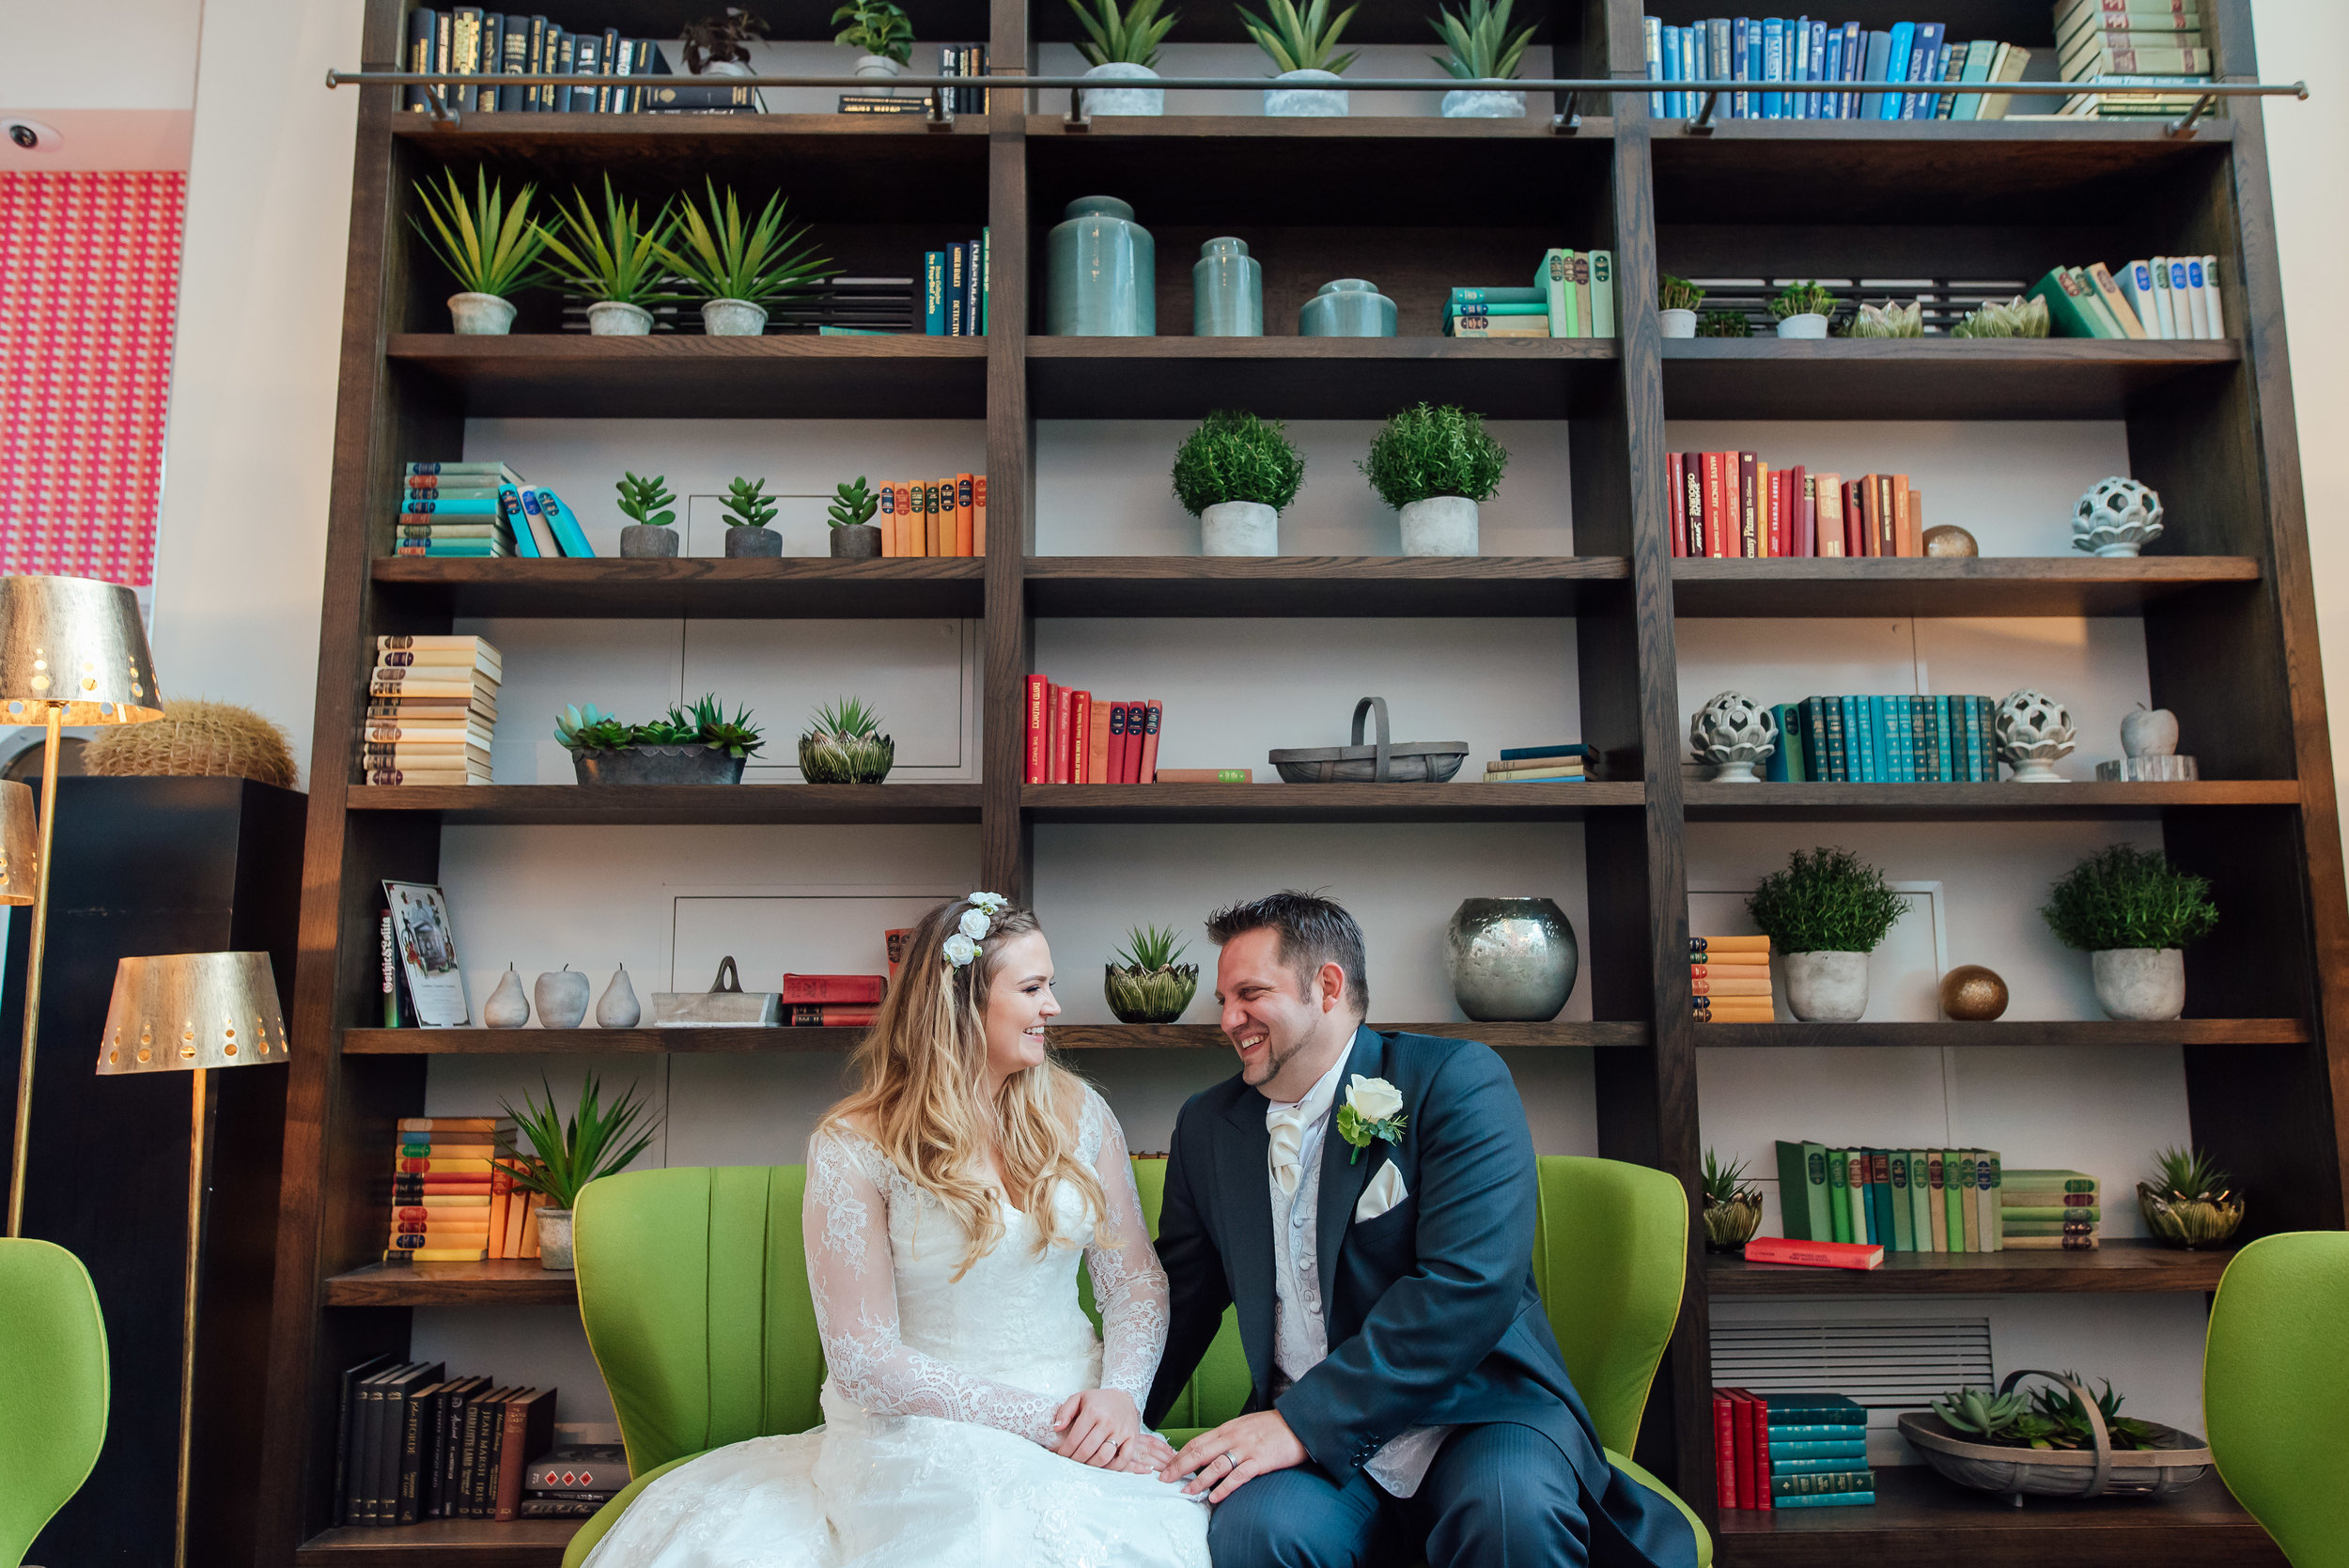 Sarah-fishlock-hampshire-wedding-photograper / hampshire-wedding-venue / wedding-guilford / wedding-photographer-surrey / fleet-wedding-photographer-hampshire / Guildford-harbour-hotel-wedding